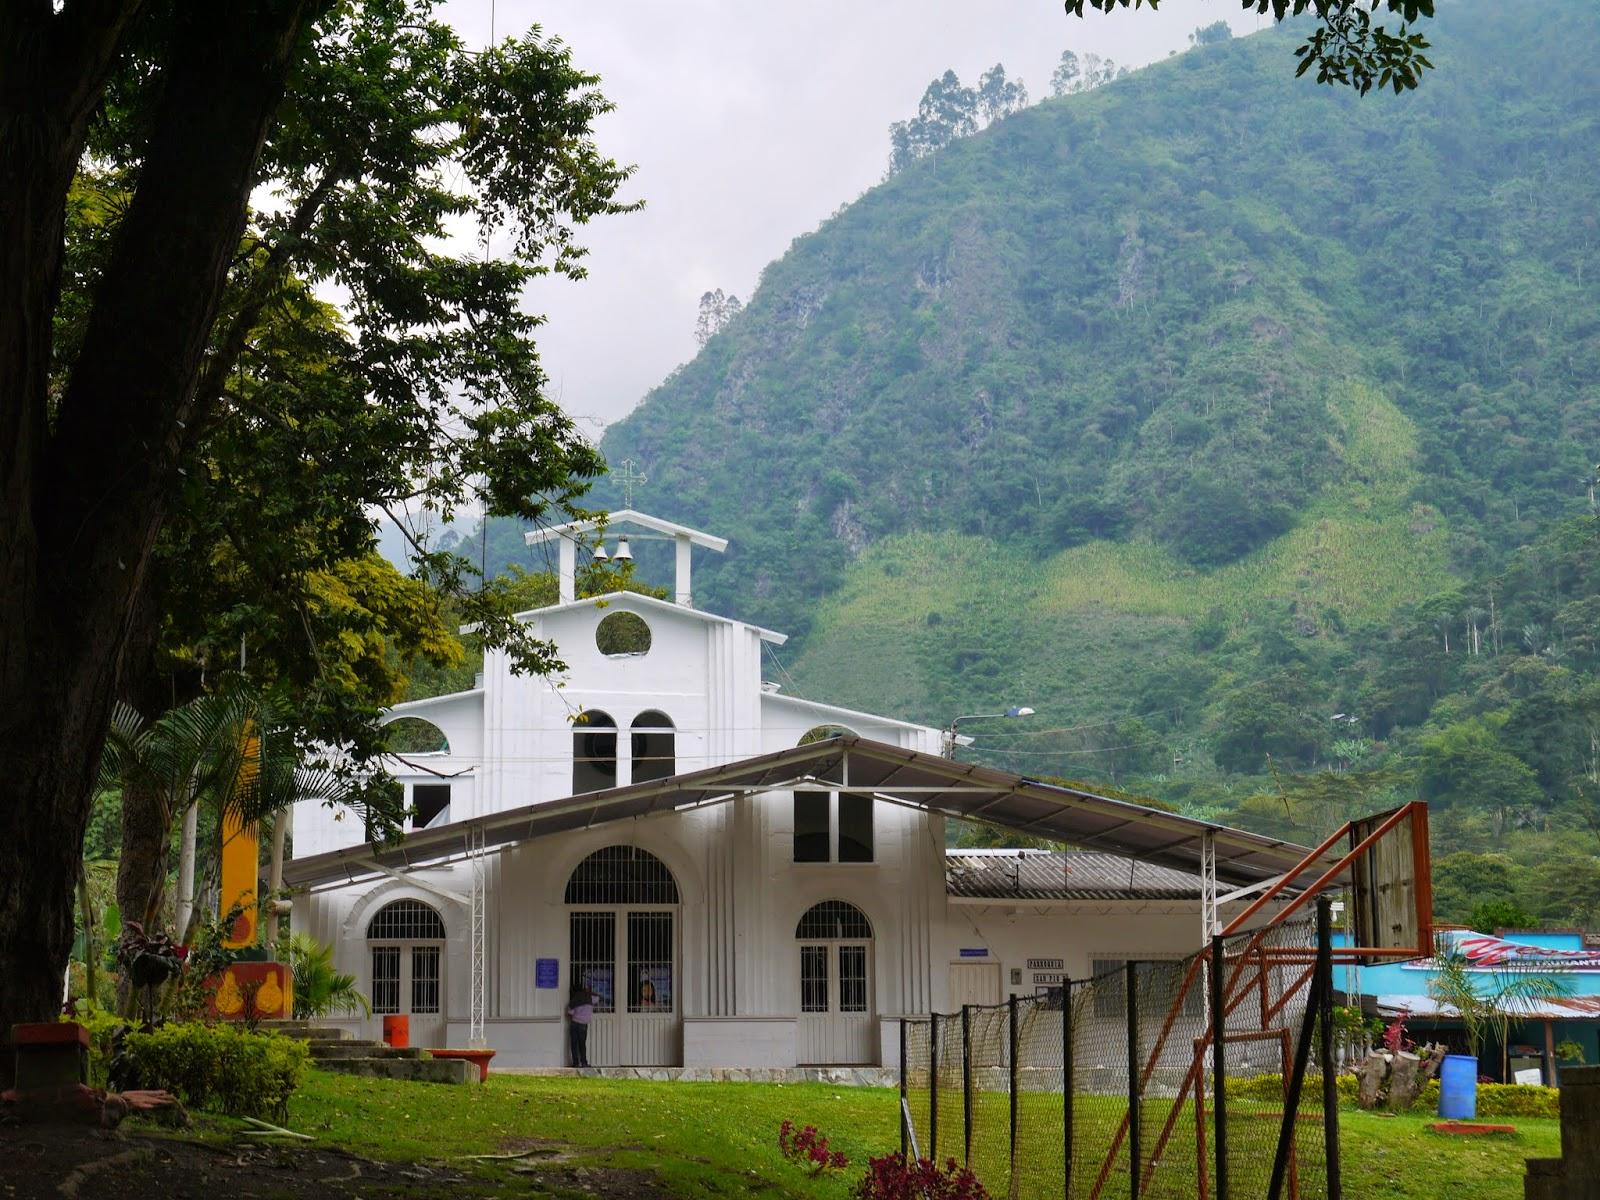 Iglesia Villa Restrepo - Ibague